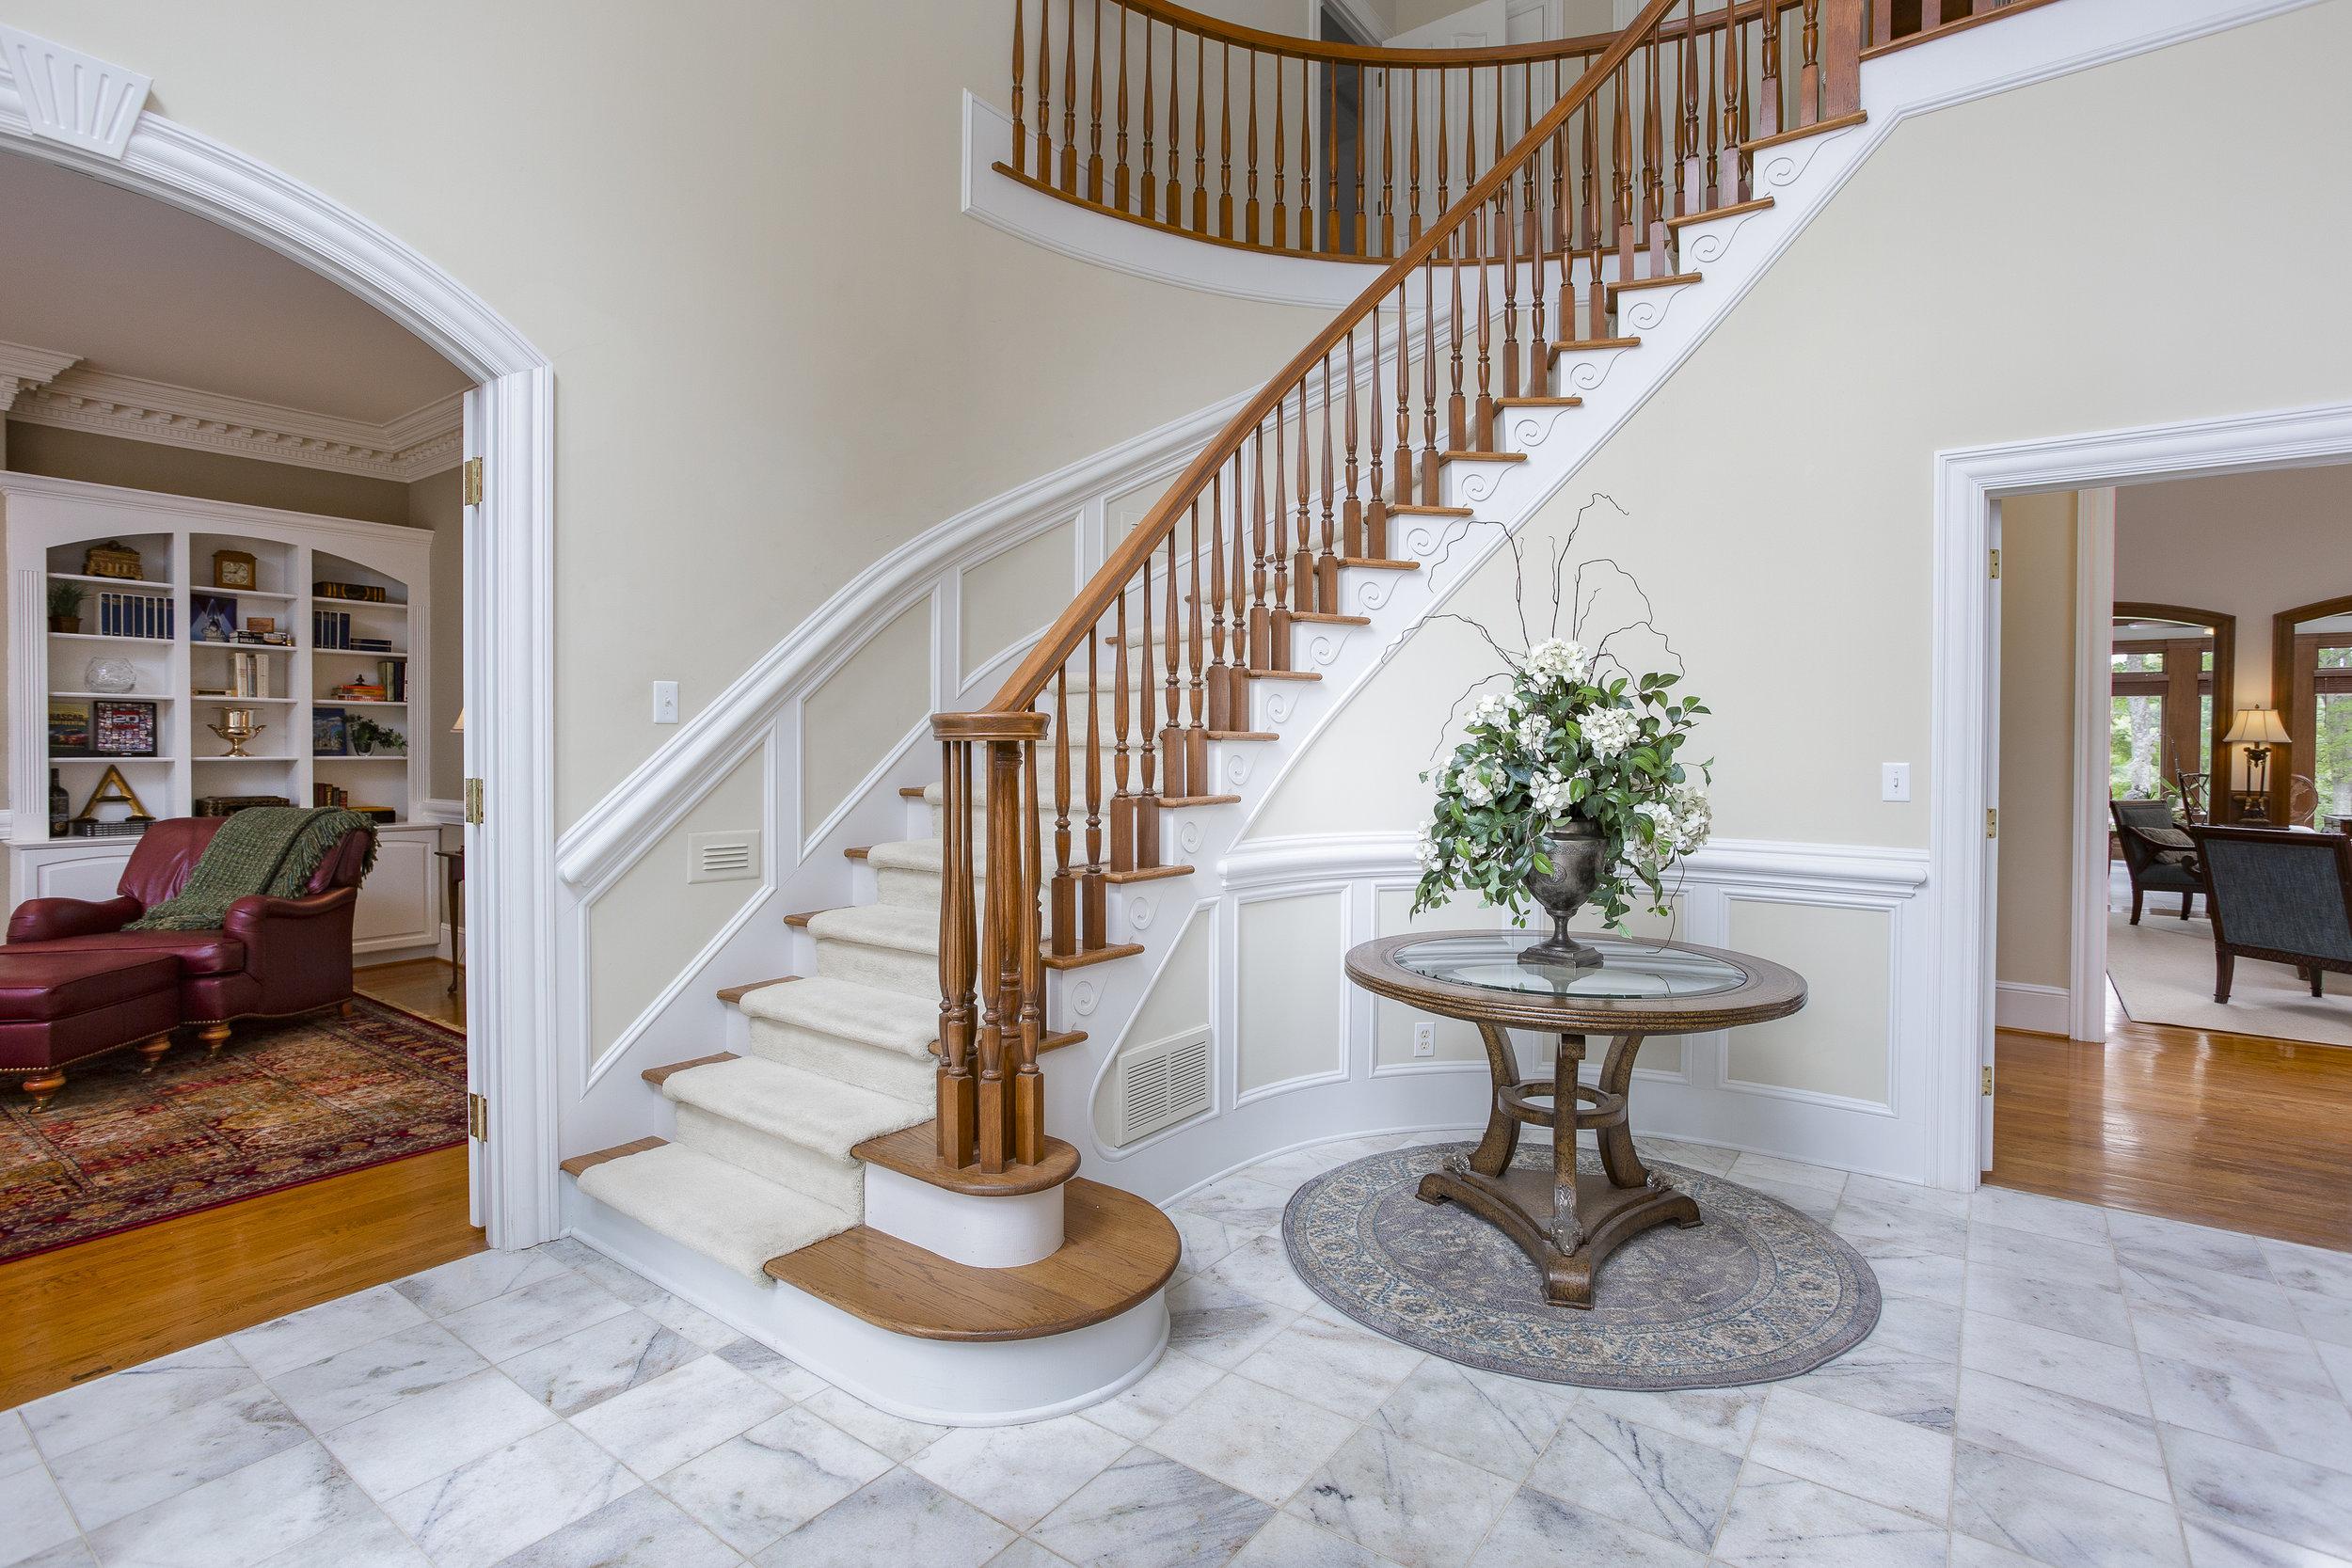 triad-real-estate-photography-drone-aerial-photographer-realtor-high-point-greensboro-kernersville-burlington02.jpg